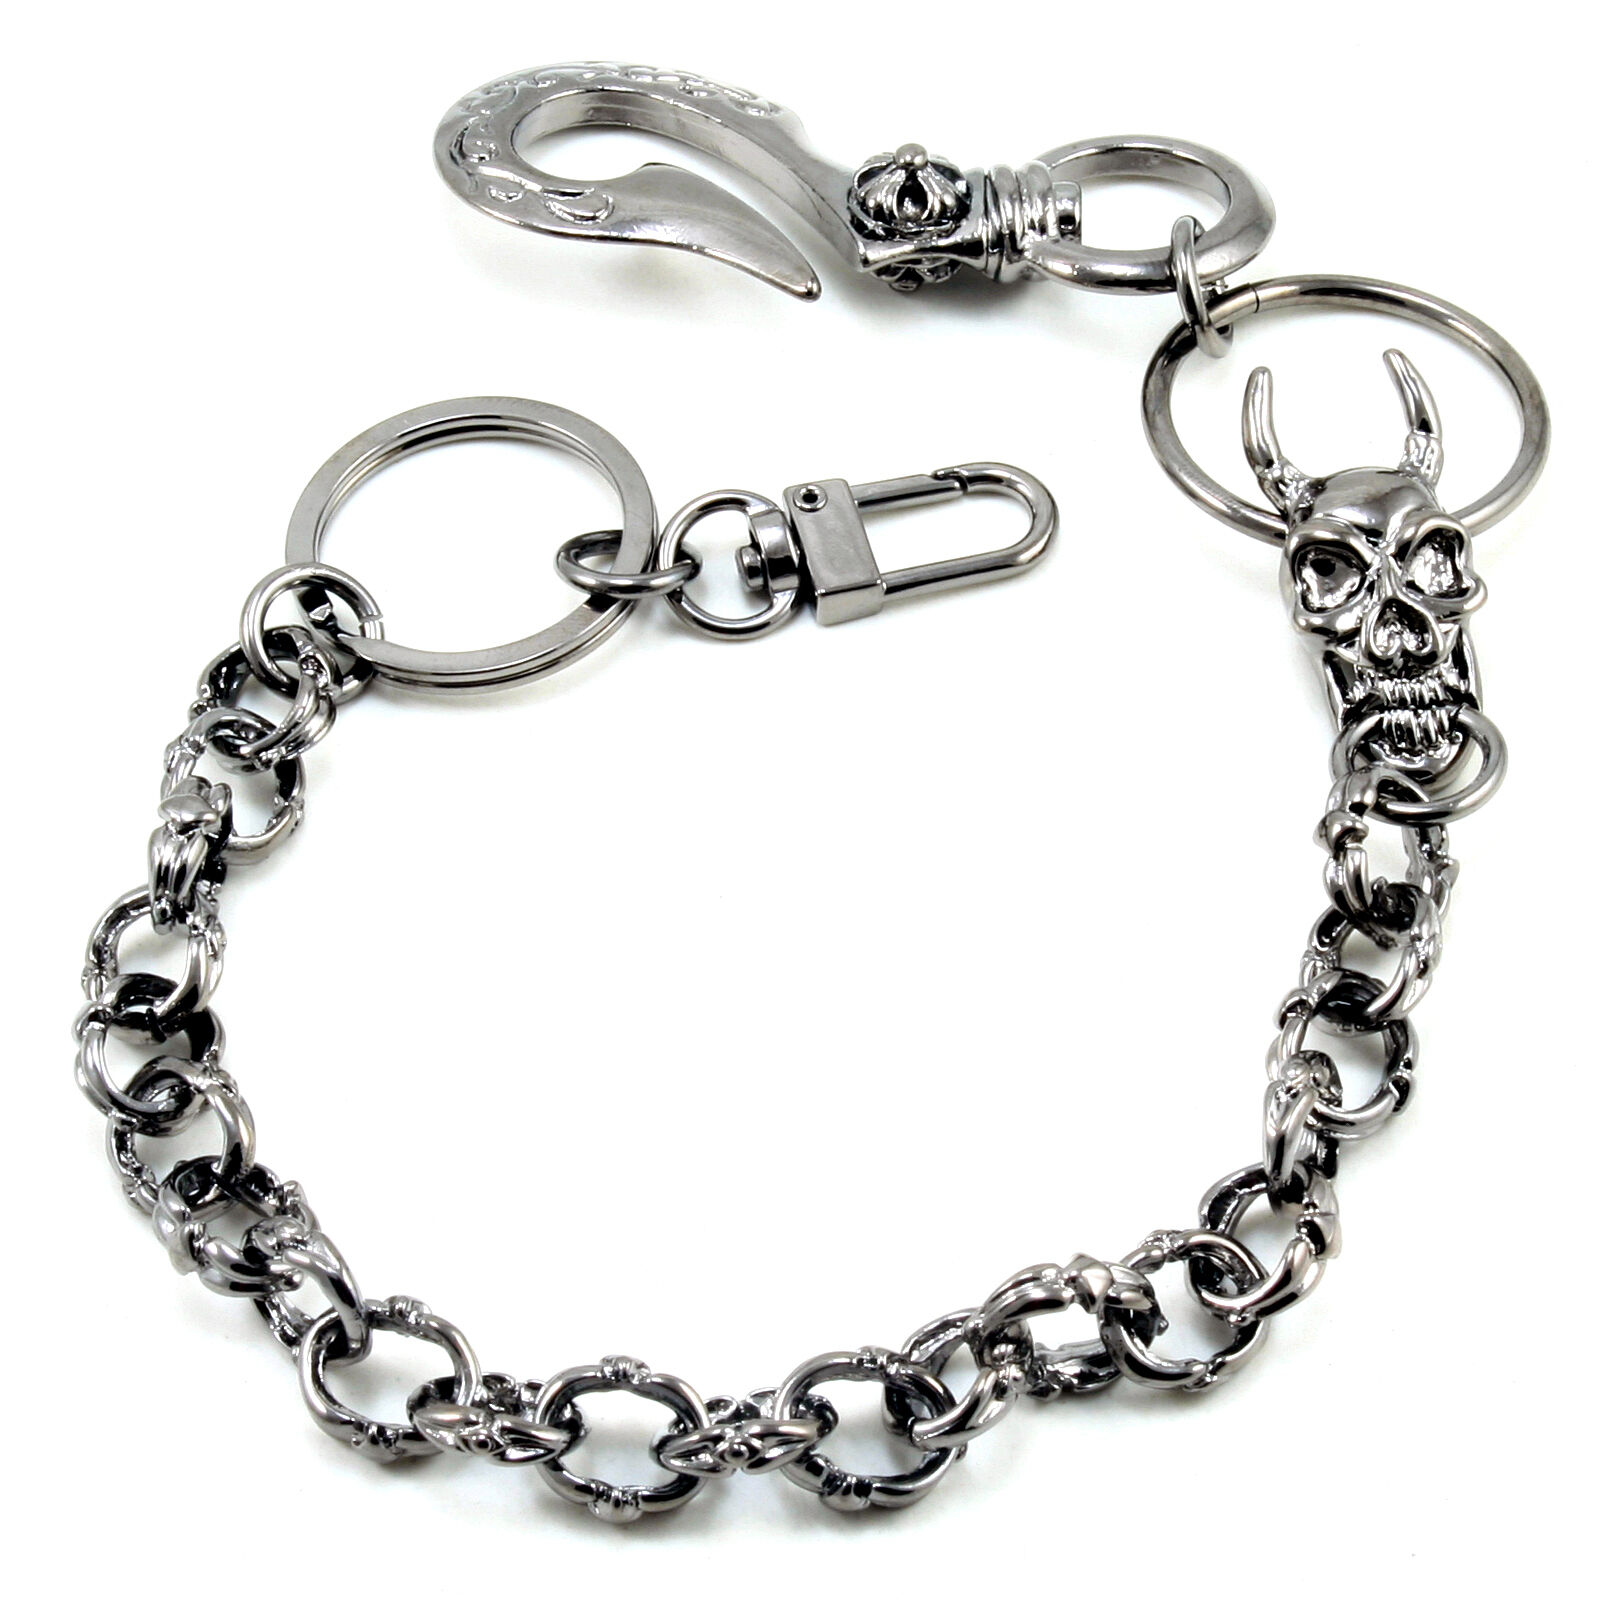 DK Skull Medieval Knight Gothic Key Jean Wallet Chain BLK//SLV CS105 /& ACS110